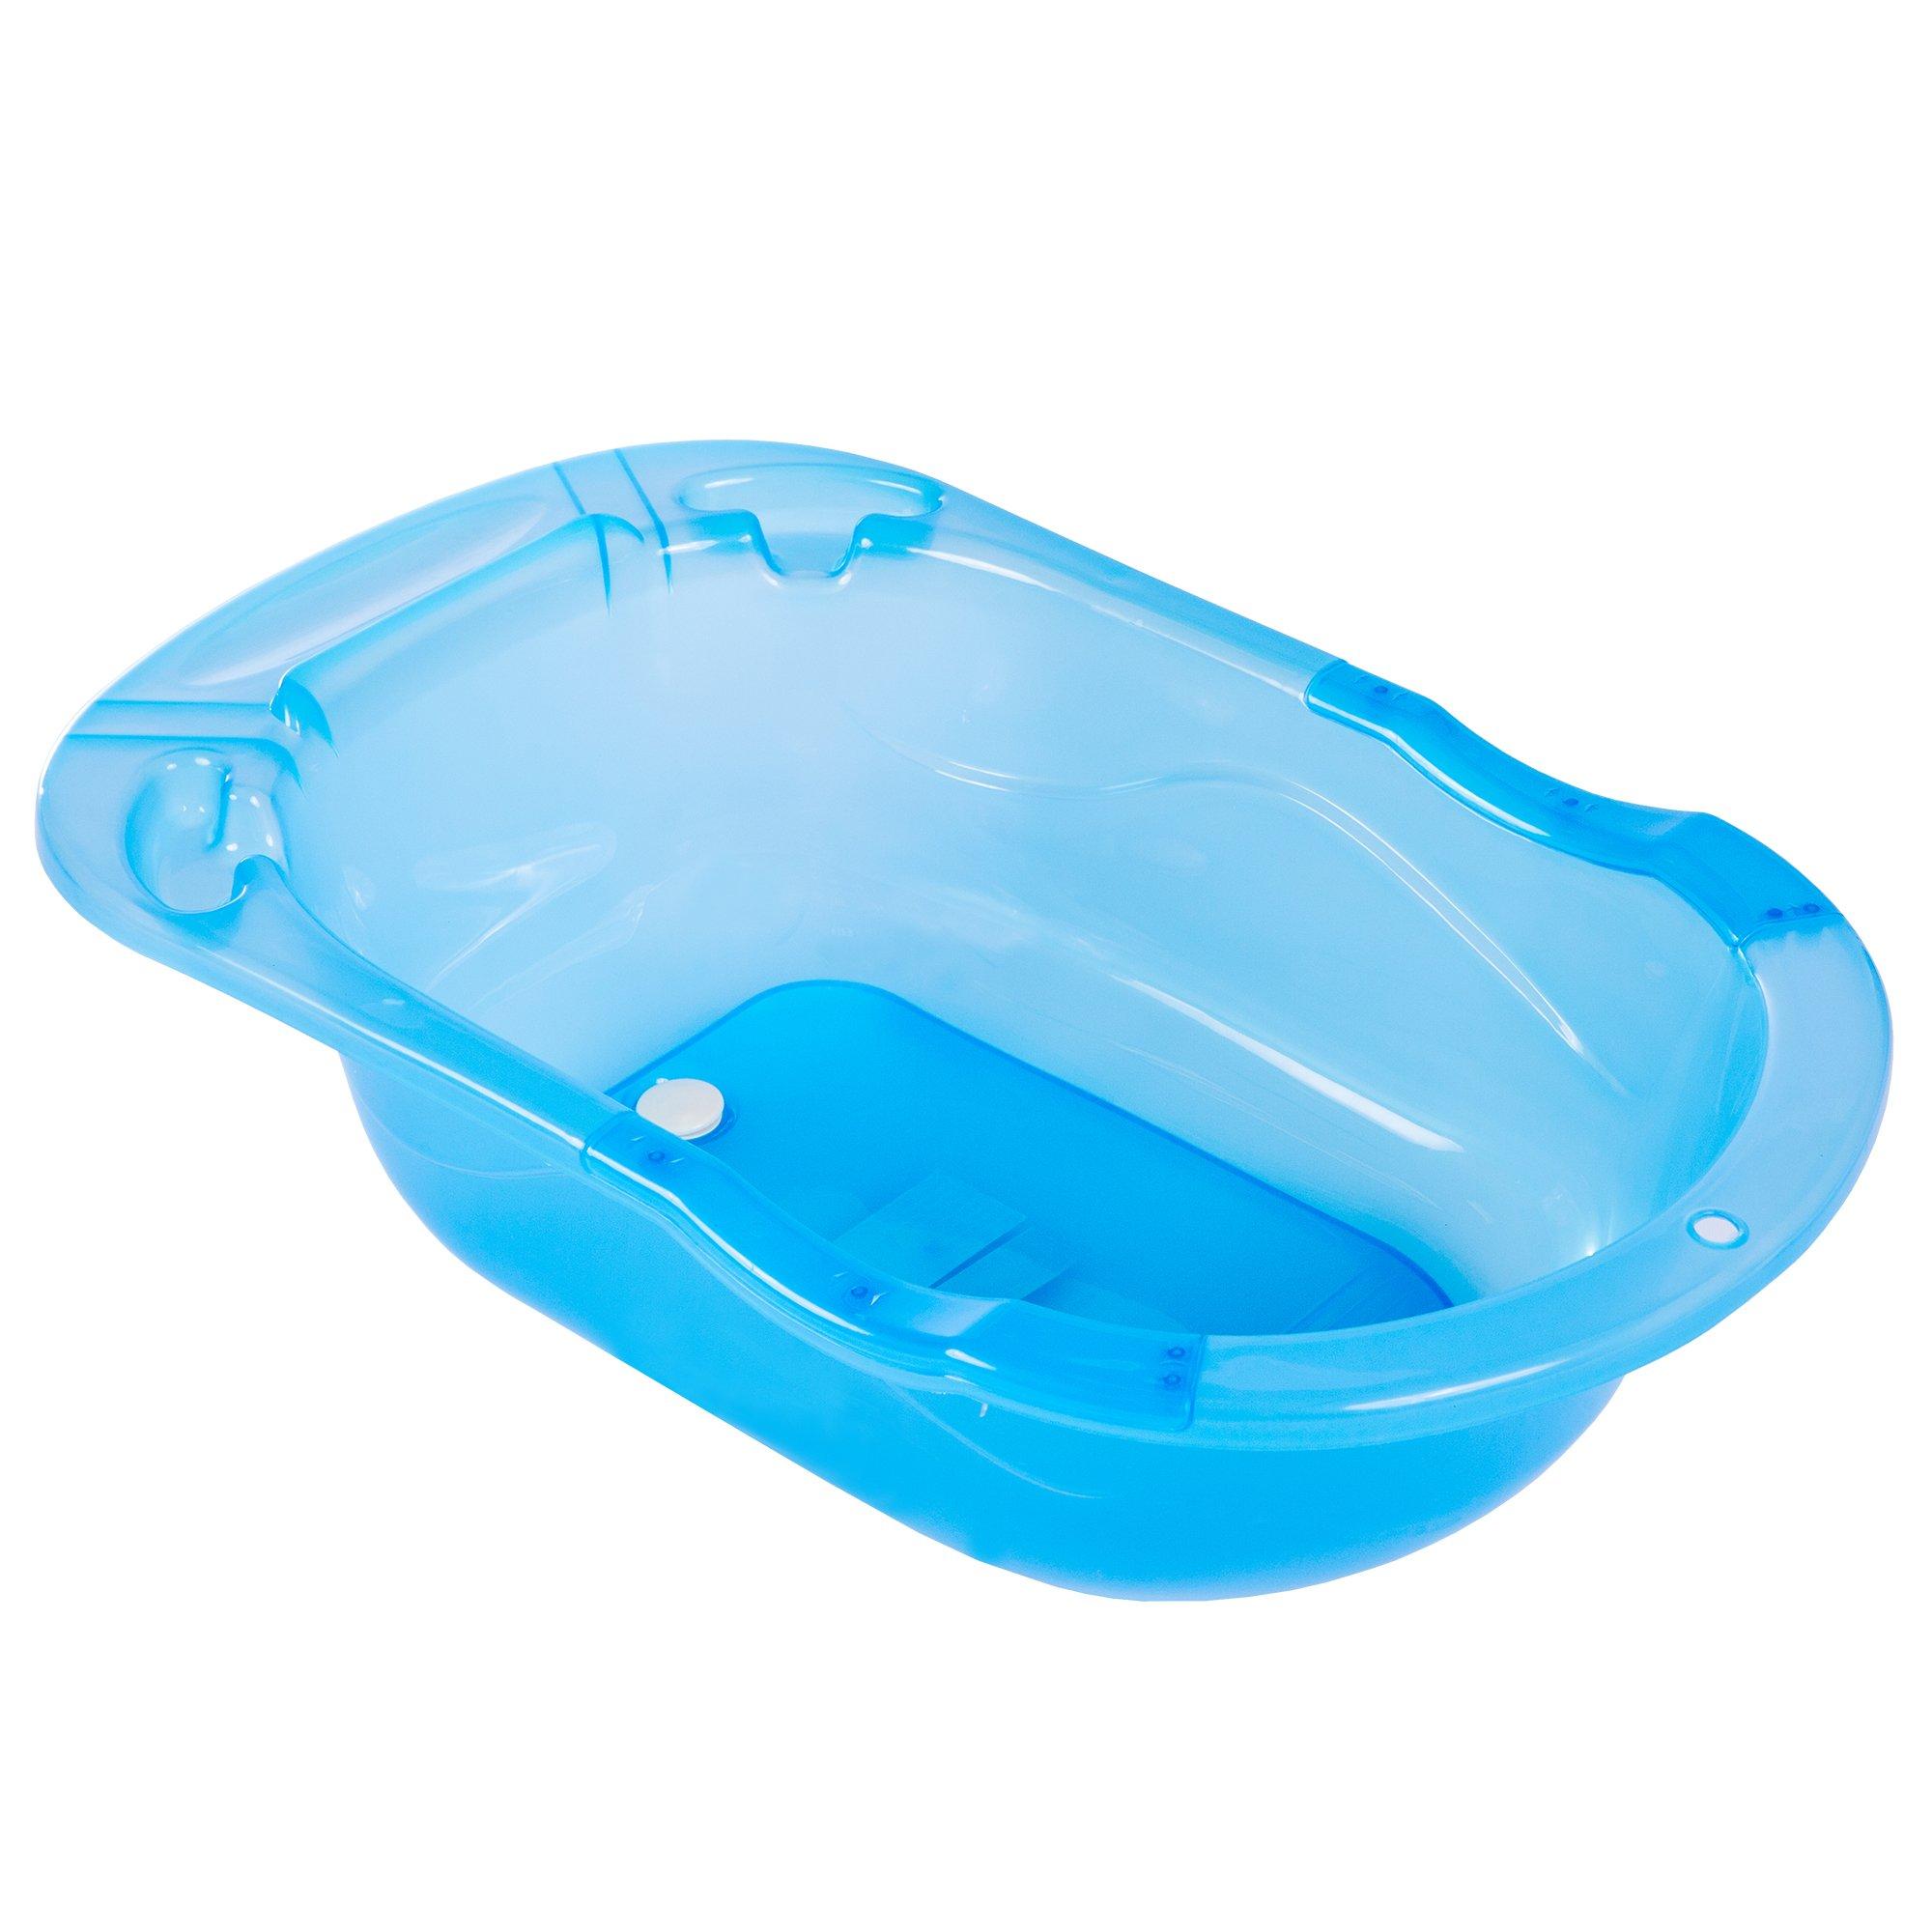 Amazon.com : Dream On Me Baby Bather Bath Tub Stand, Gray : Baby ...